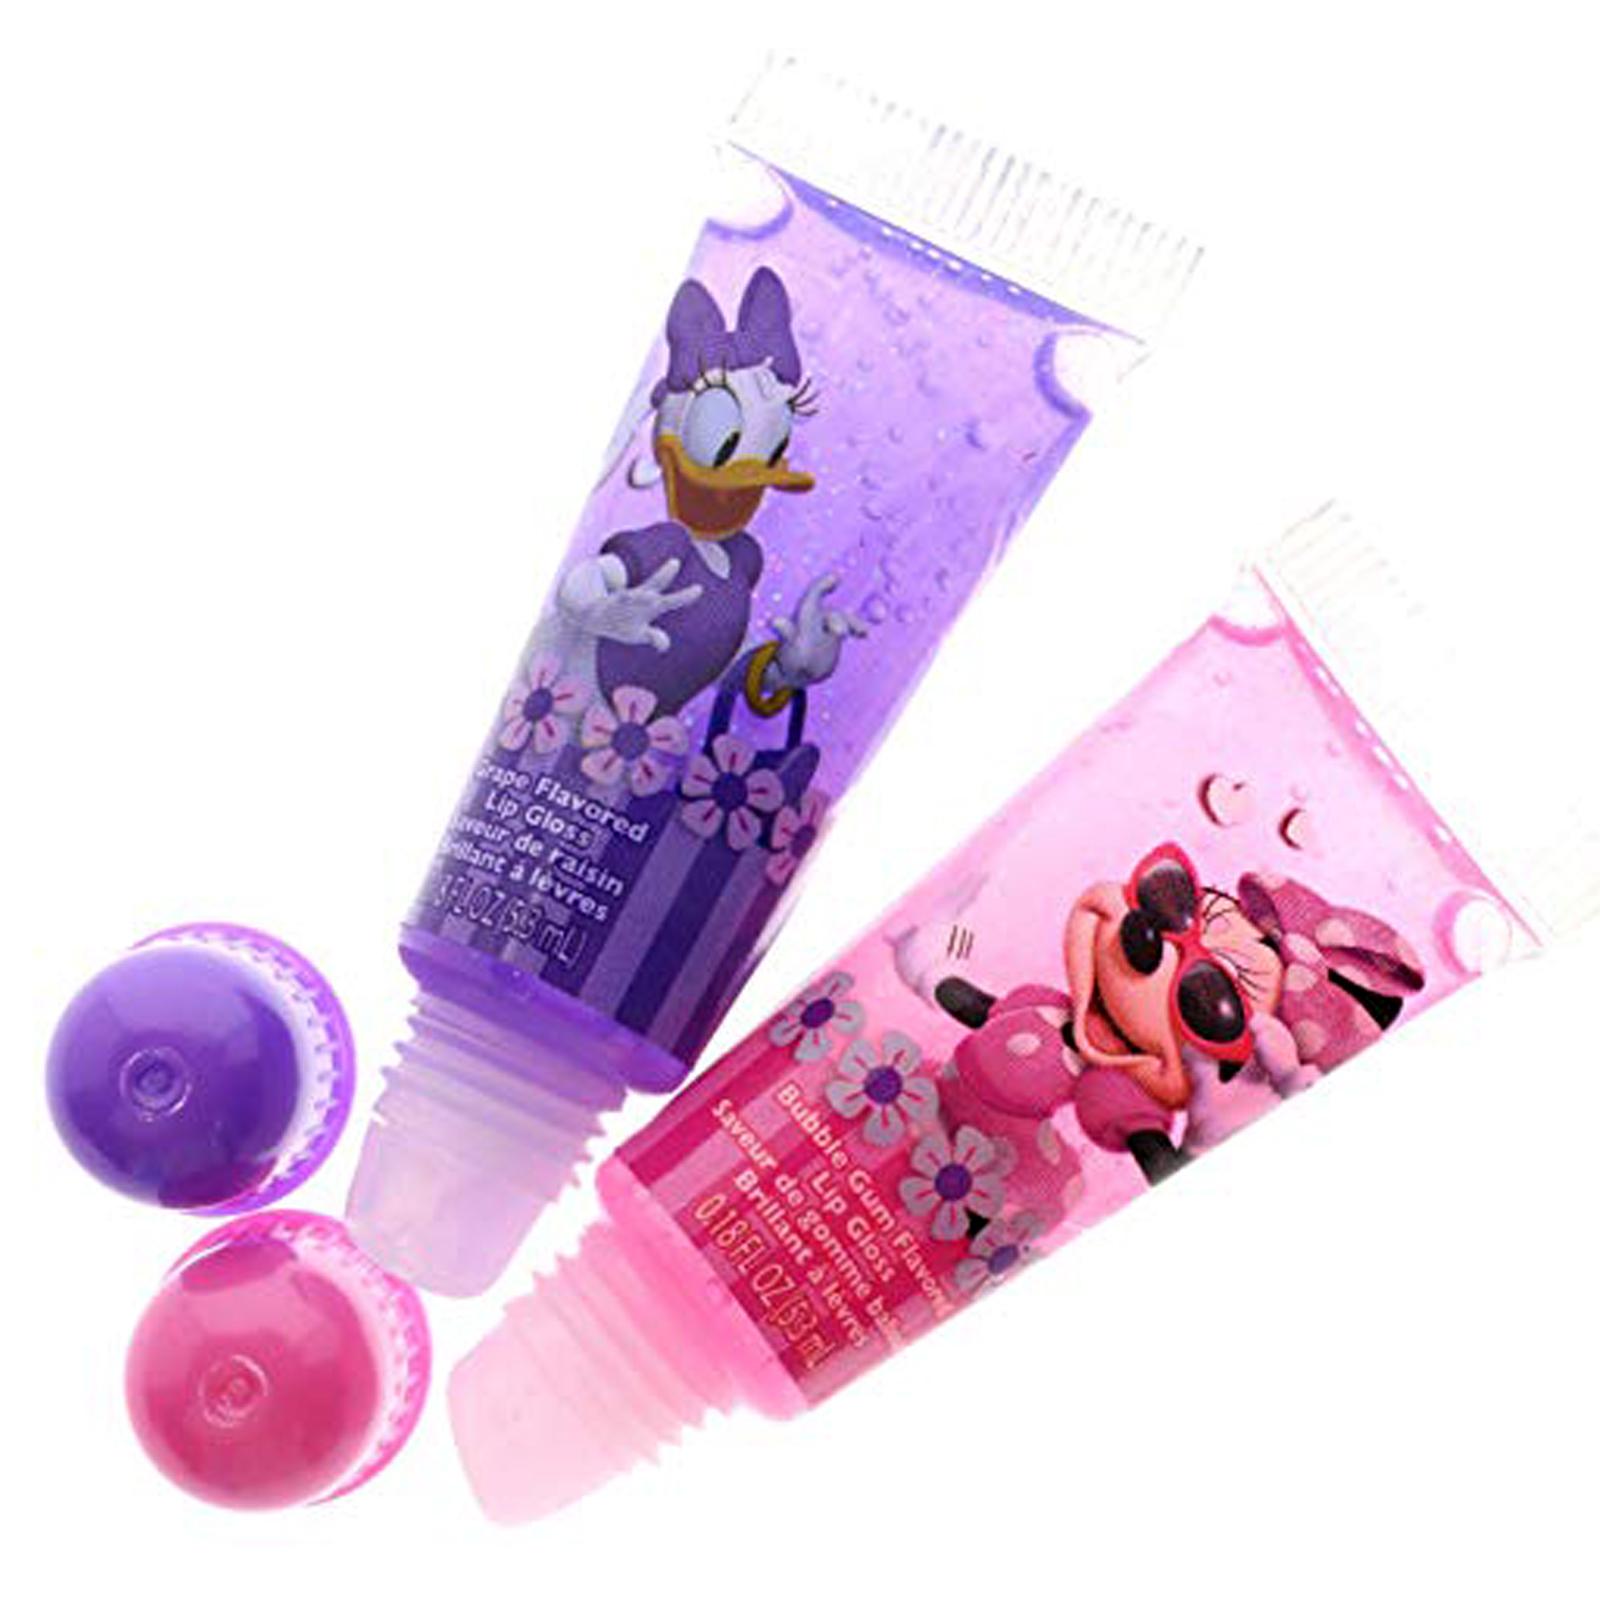 Disney Minnie Mouse and Daisy Duck Lip Gloss and Nail Polish Kit